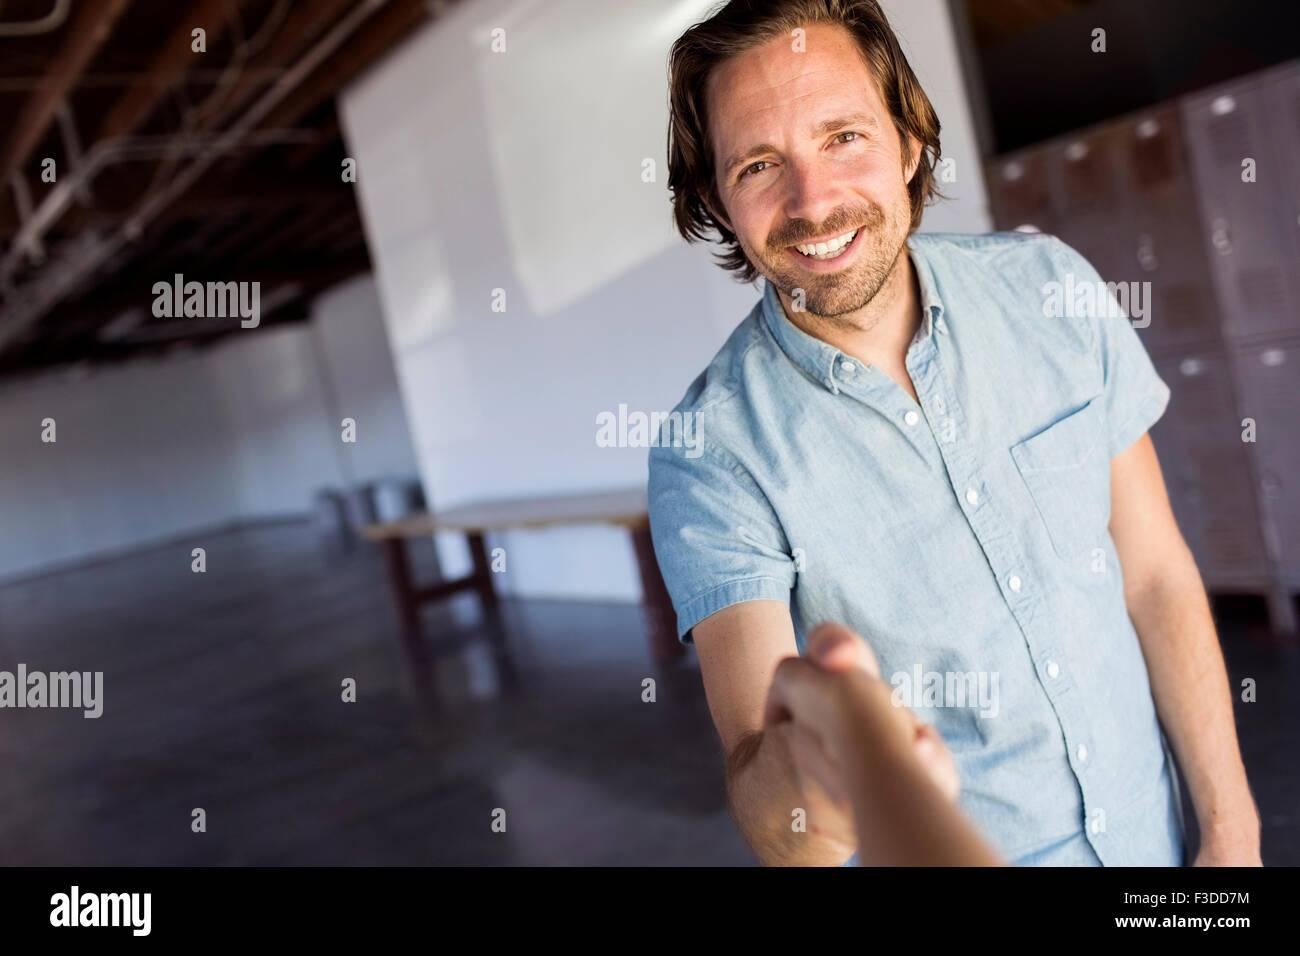 Man in warehouse Photo Stock